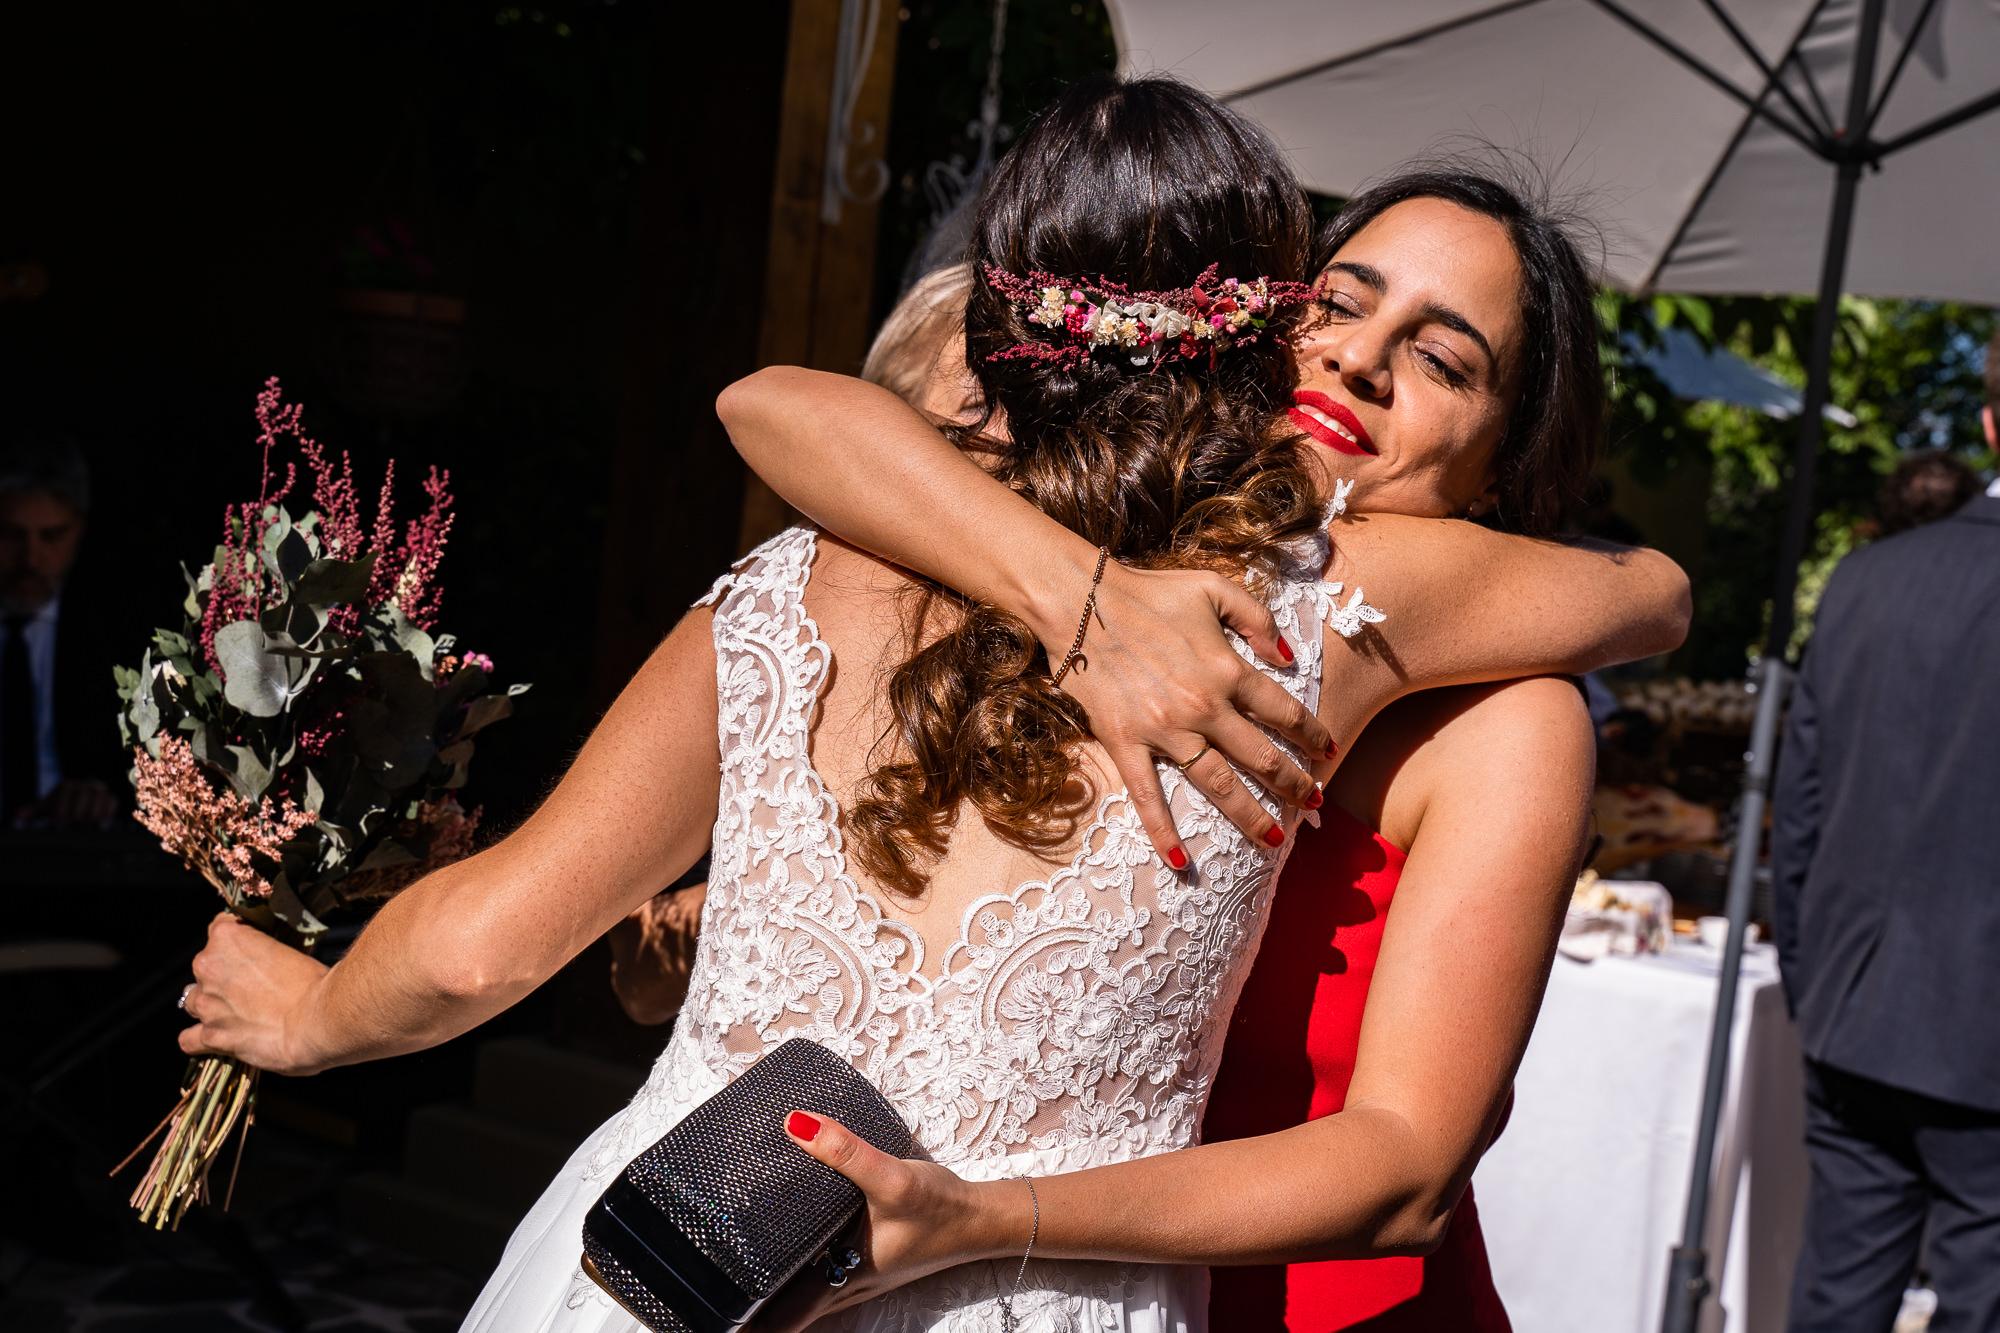 entrega del ramo de novia en la boda